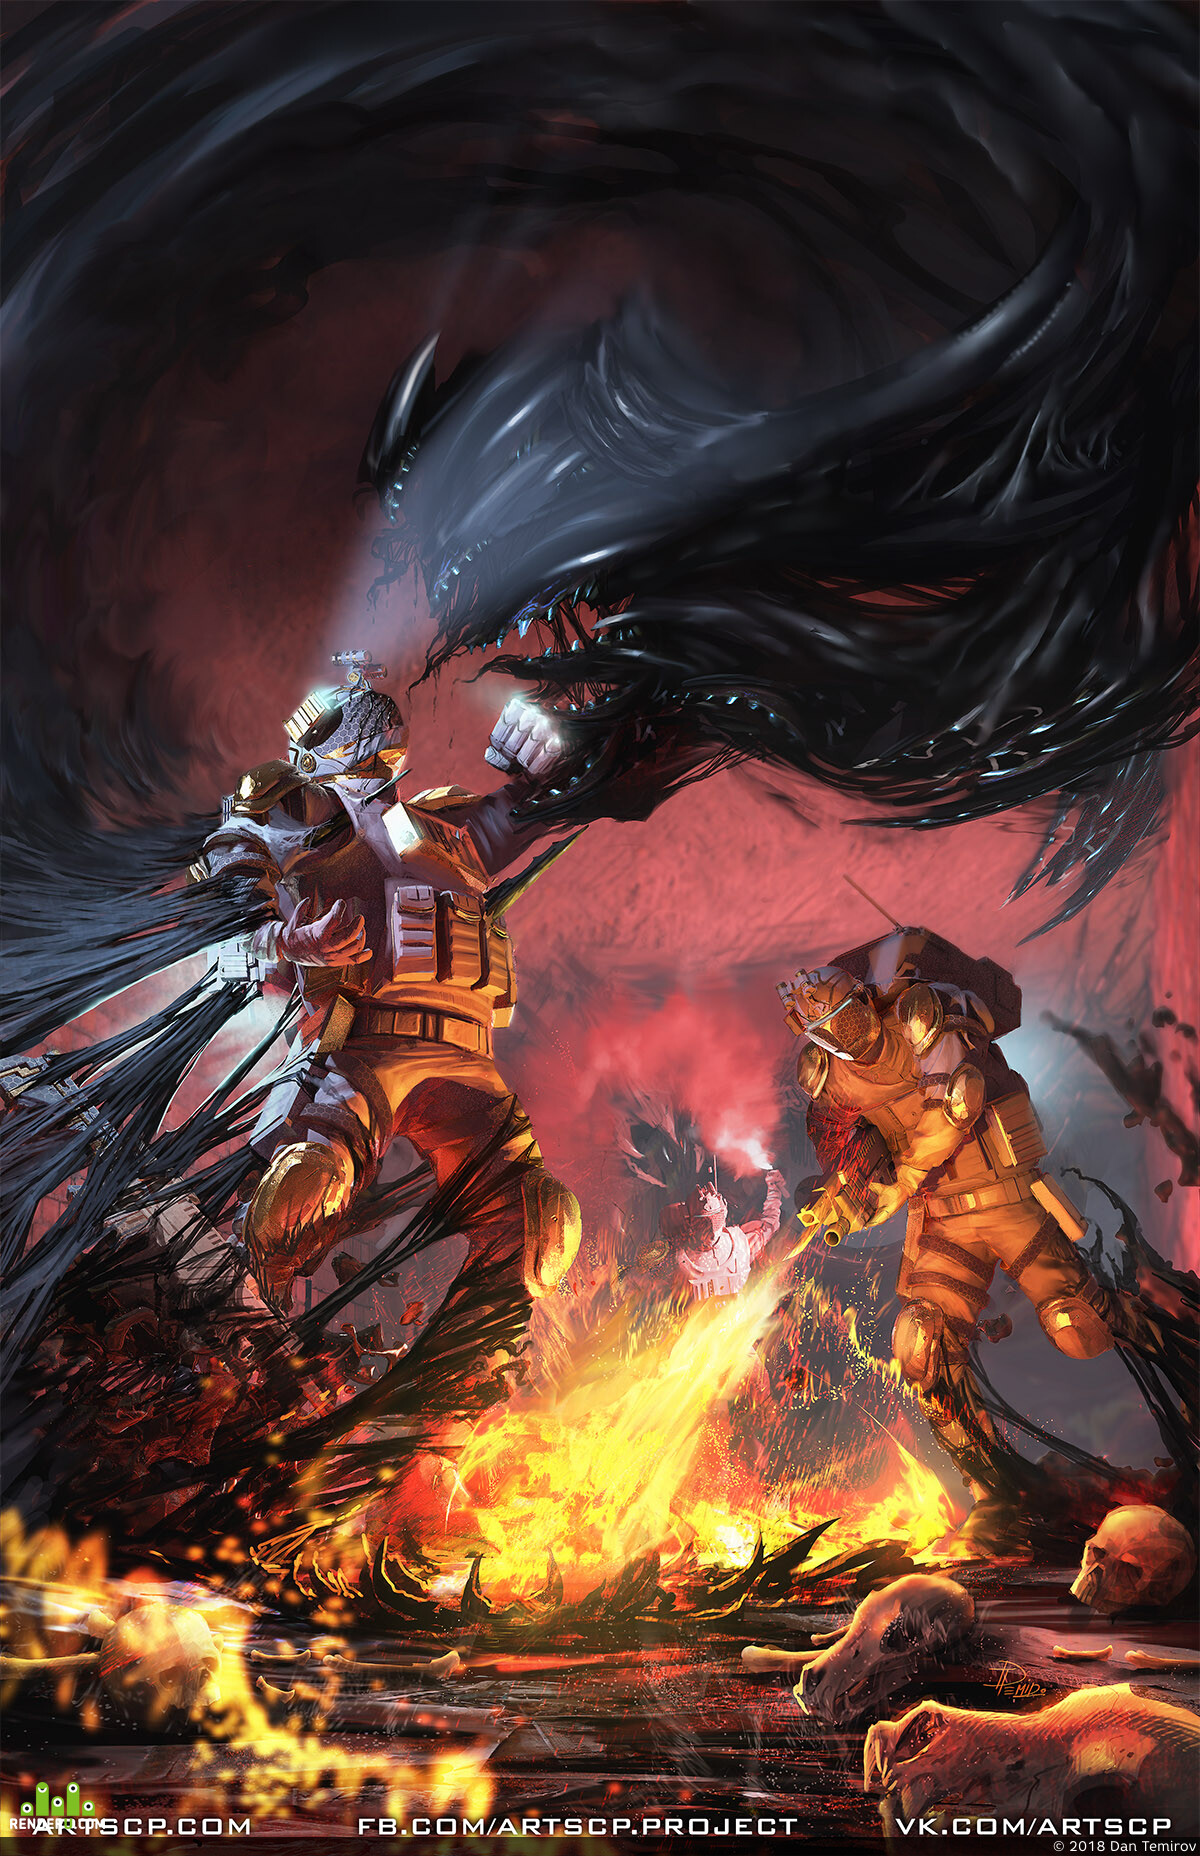 artscp, dantemirov, illustration, design_character, creature, Dark, fire